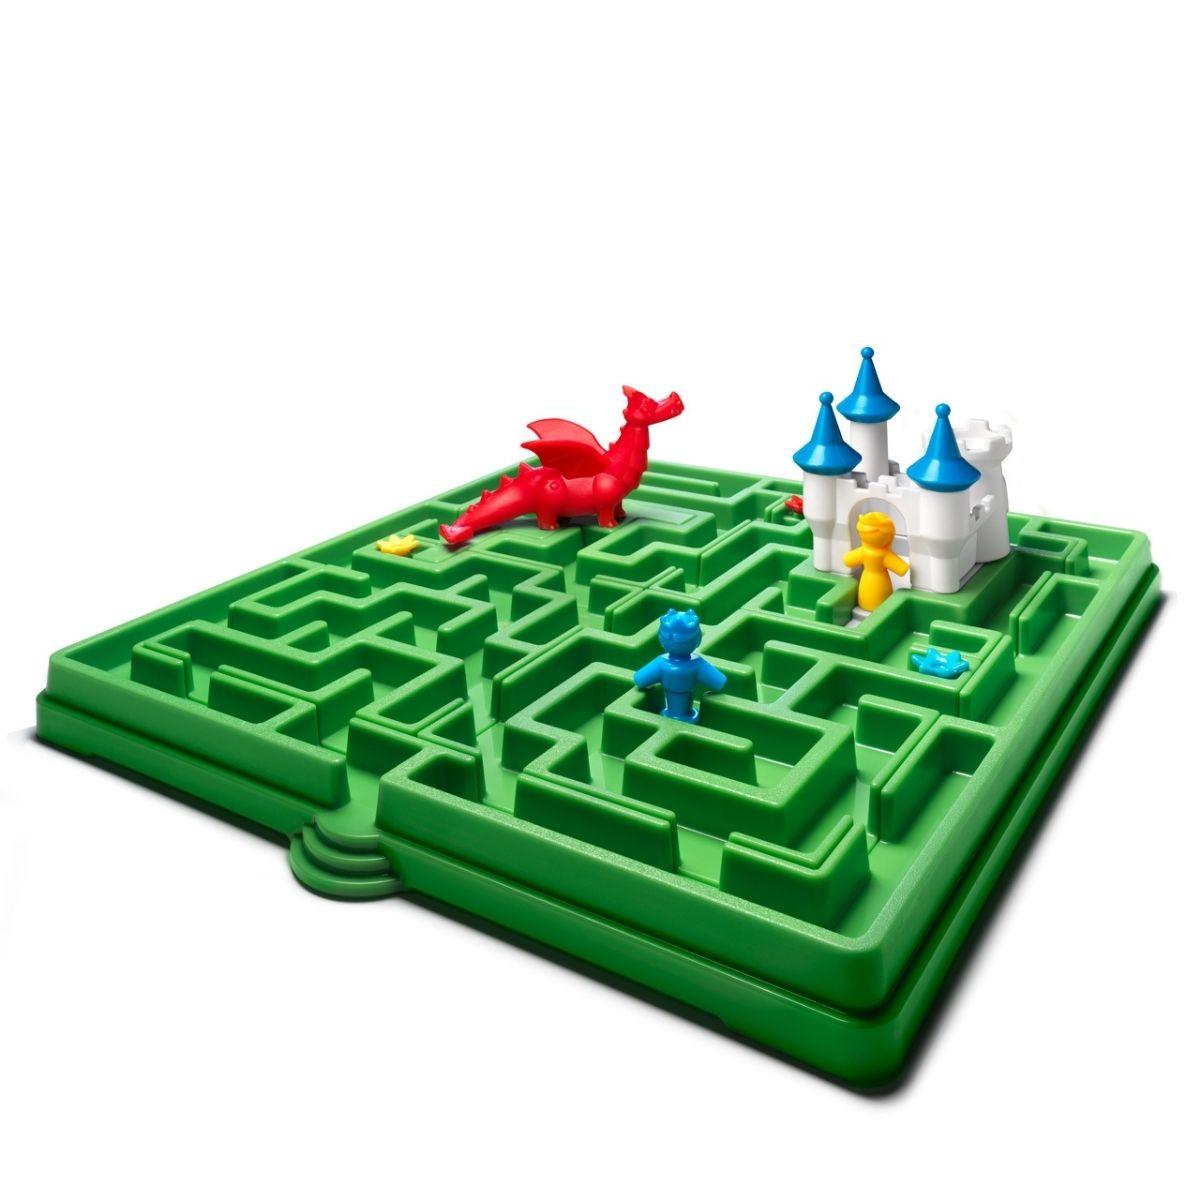 Brinquedo Educativo Labirinto - Sleeping Beauty